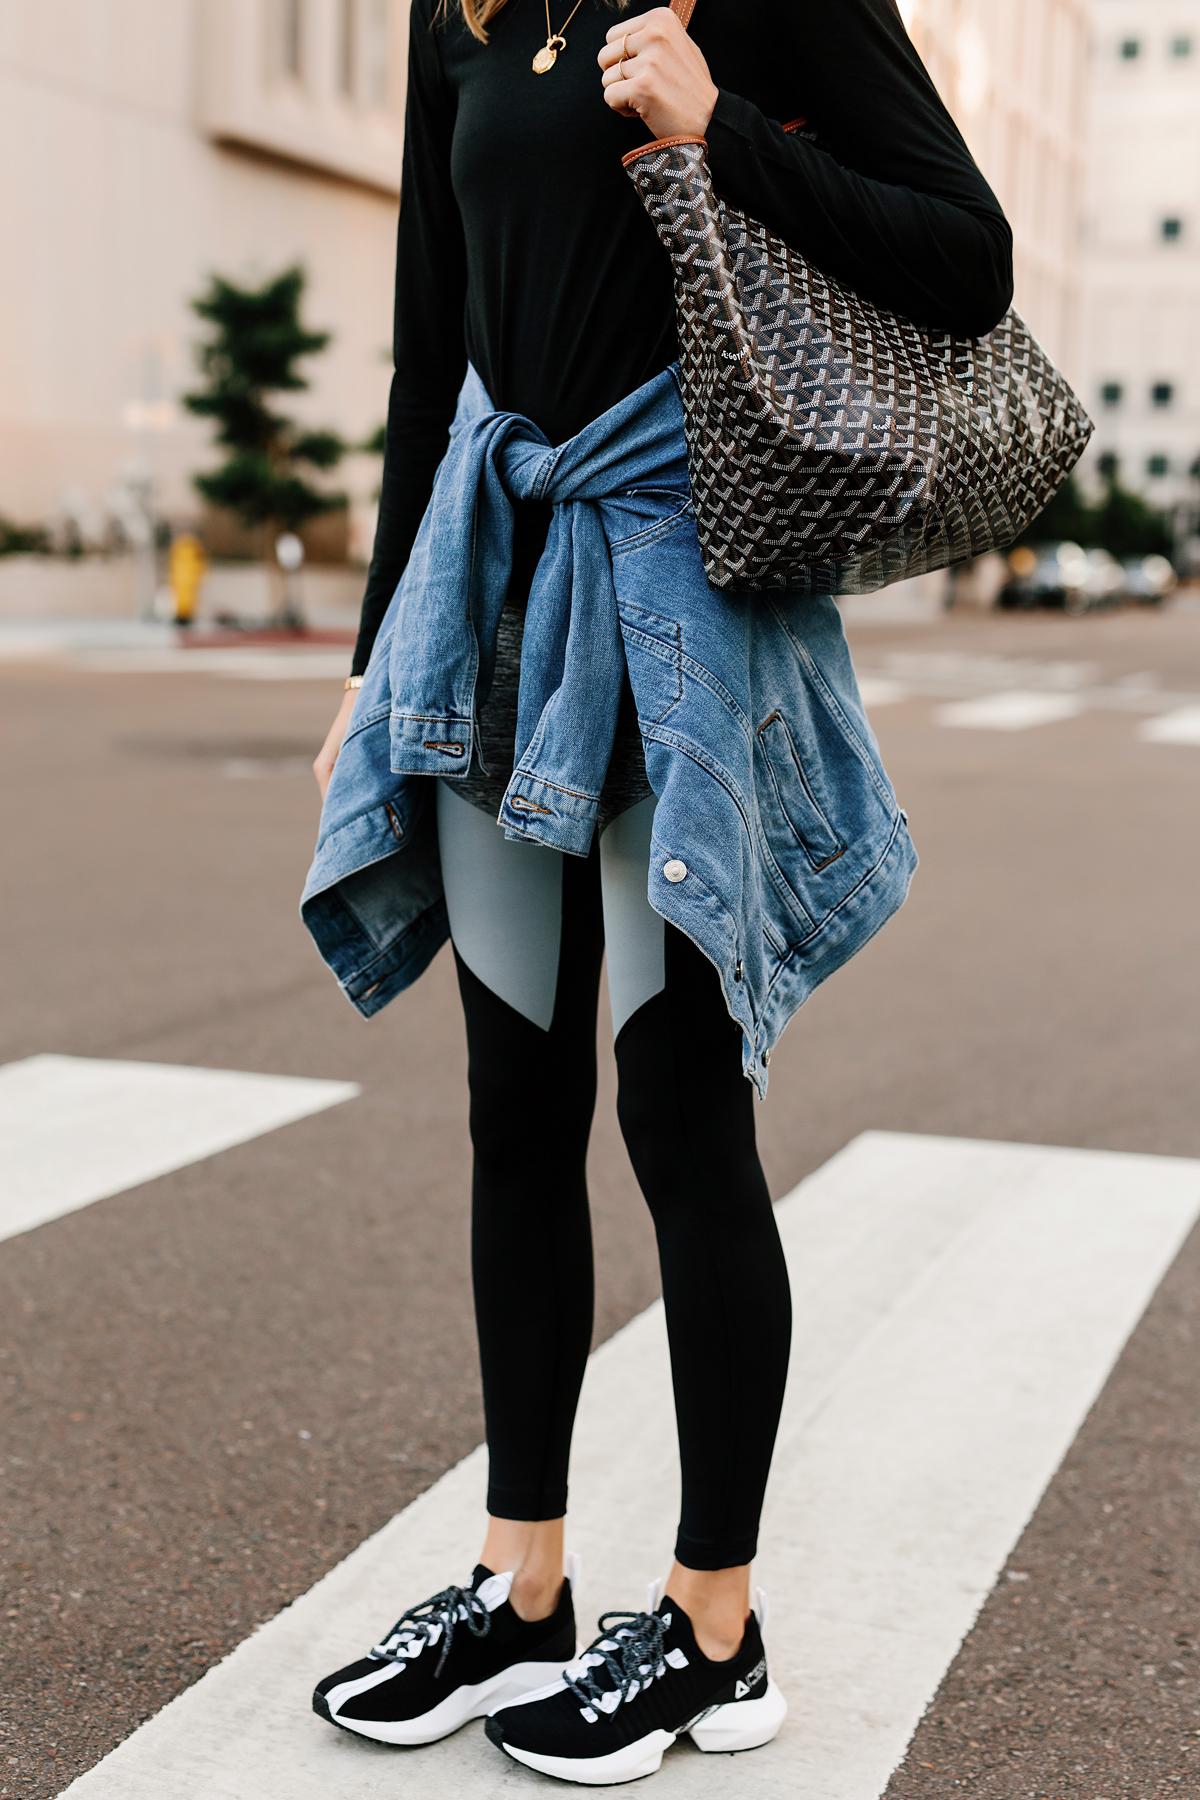 Woman Wearing Black Long Sleeve Top Denim Jacket Reebok Colorblock Leggings Reebok Sole Fury Black Sneakers Goyard Tote Fashion Jackson San Diego Fashion Blogger Athleisure Outfit